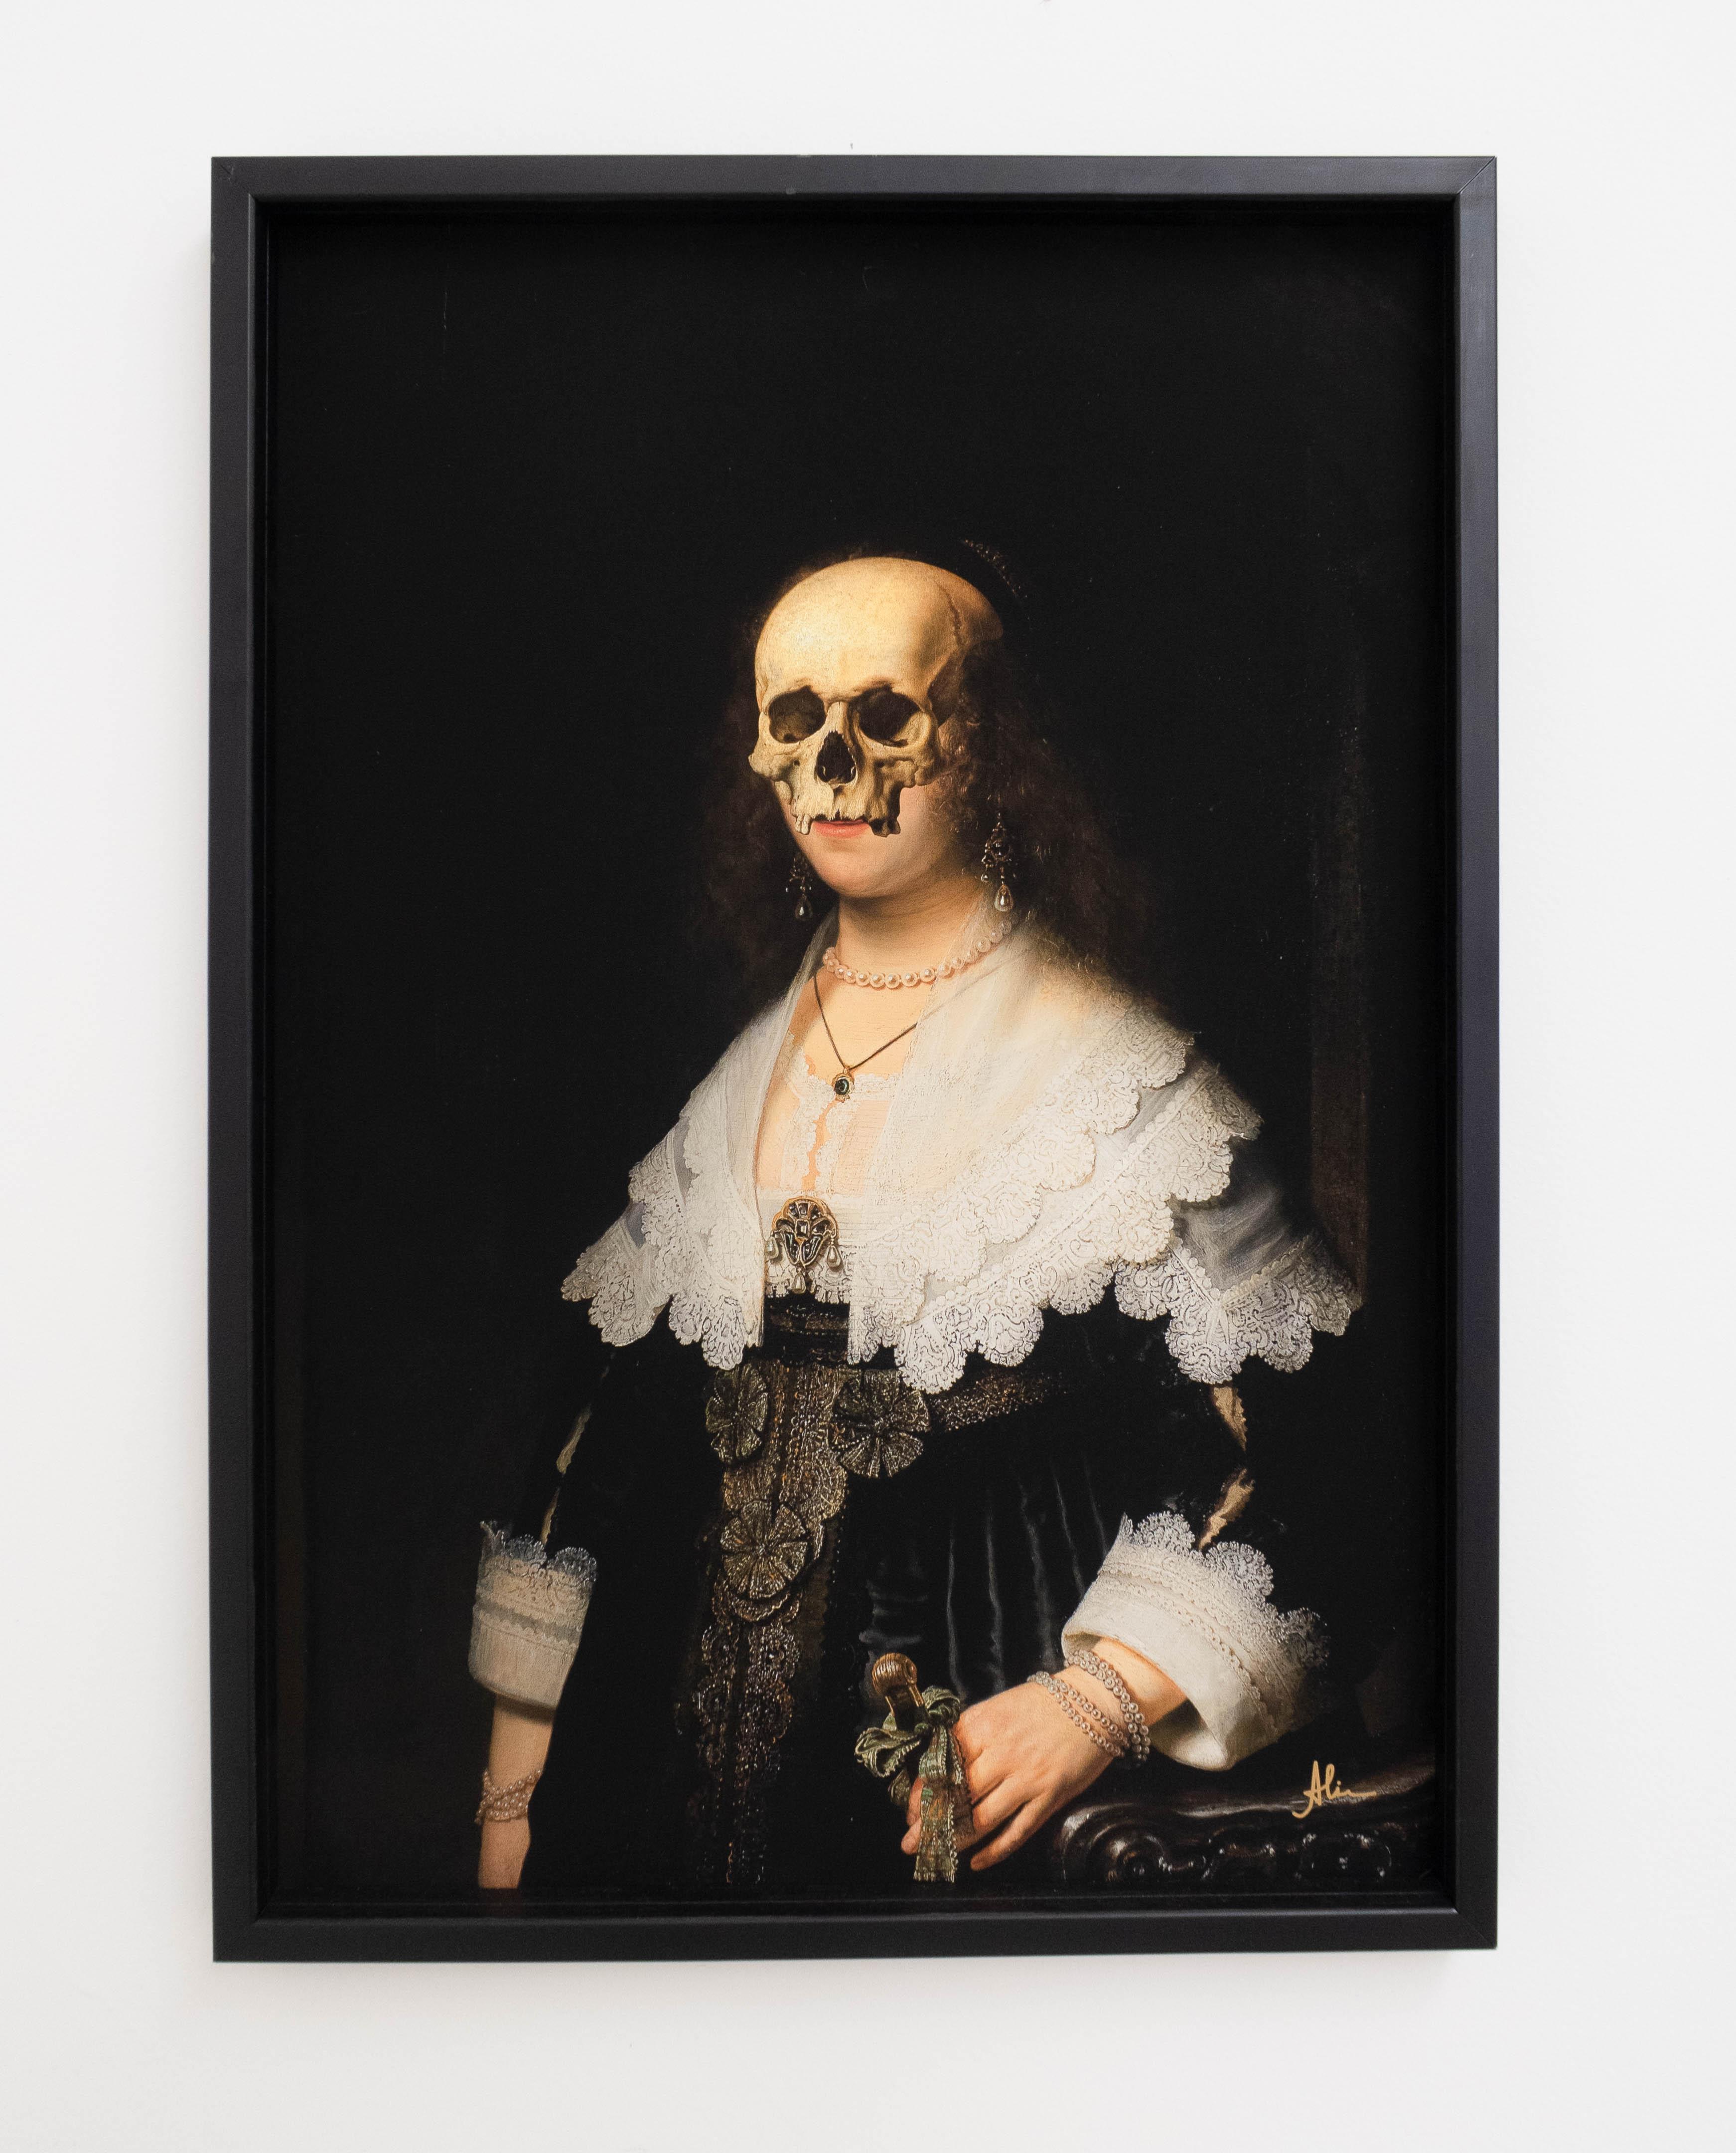 Aline Chaves, Sem Título, Colagem digital impressa em papel Canson Performance 240g, 59,4 x 42 cm, 2019